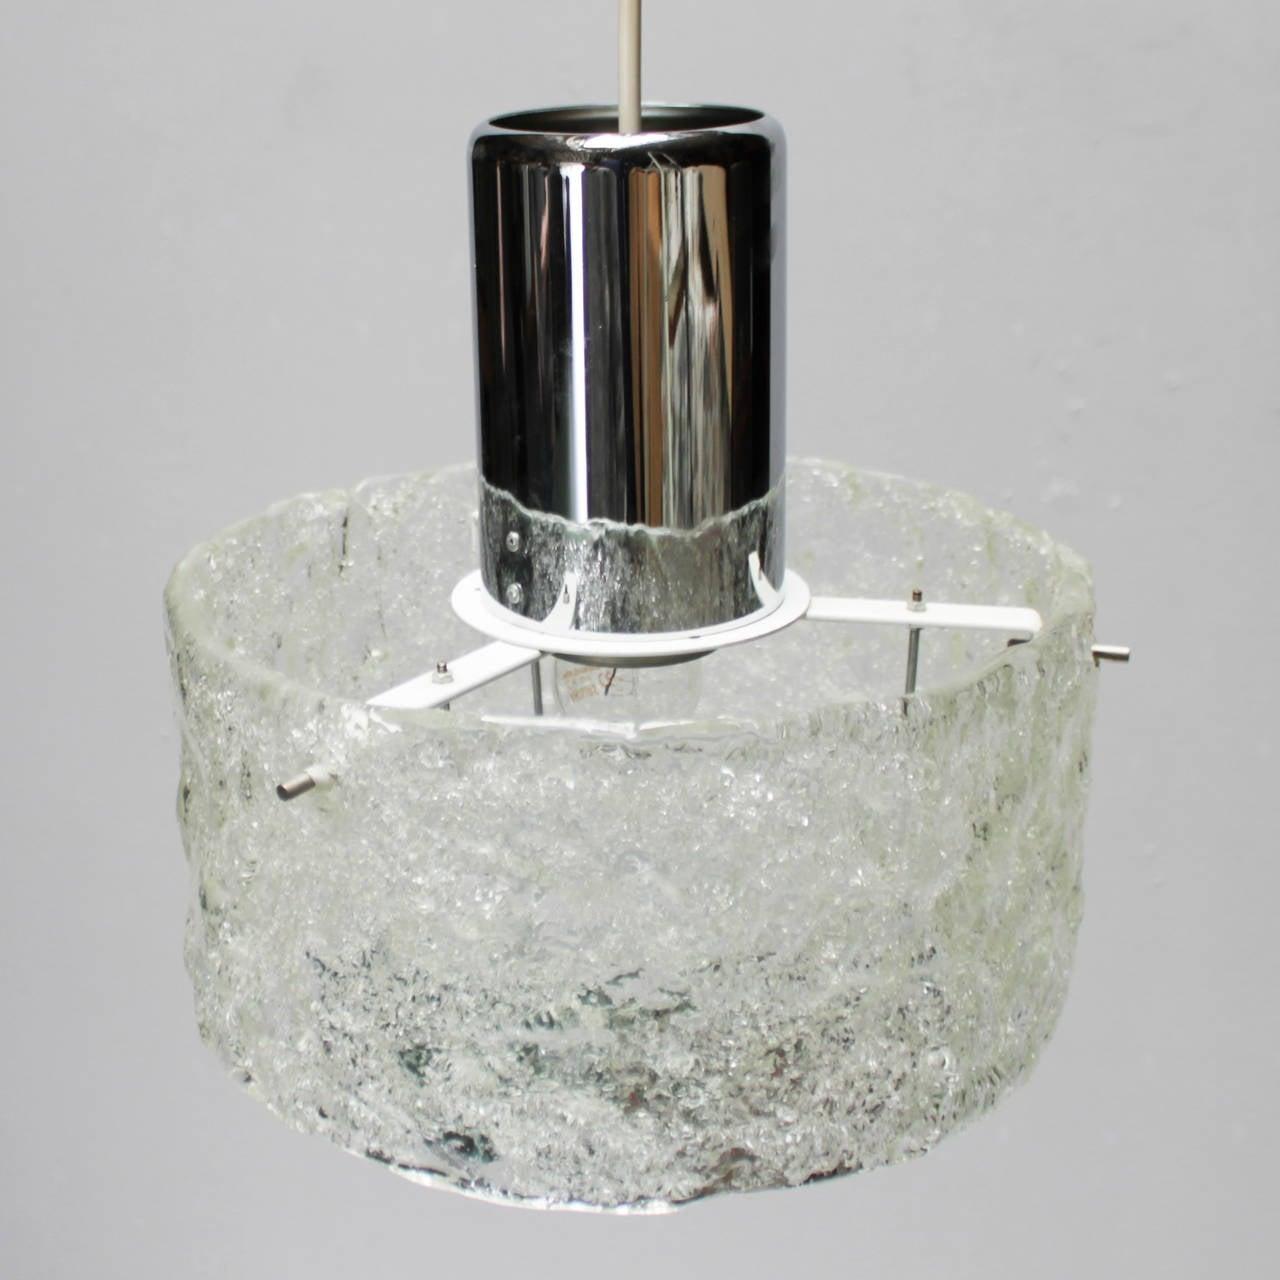 Mid-Century Modern Pendant in the style of Kalmar Lighting For Sale